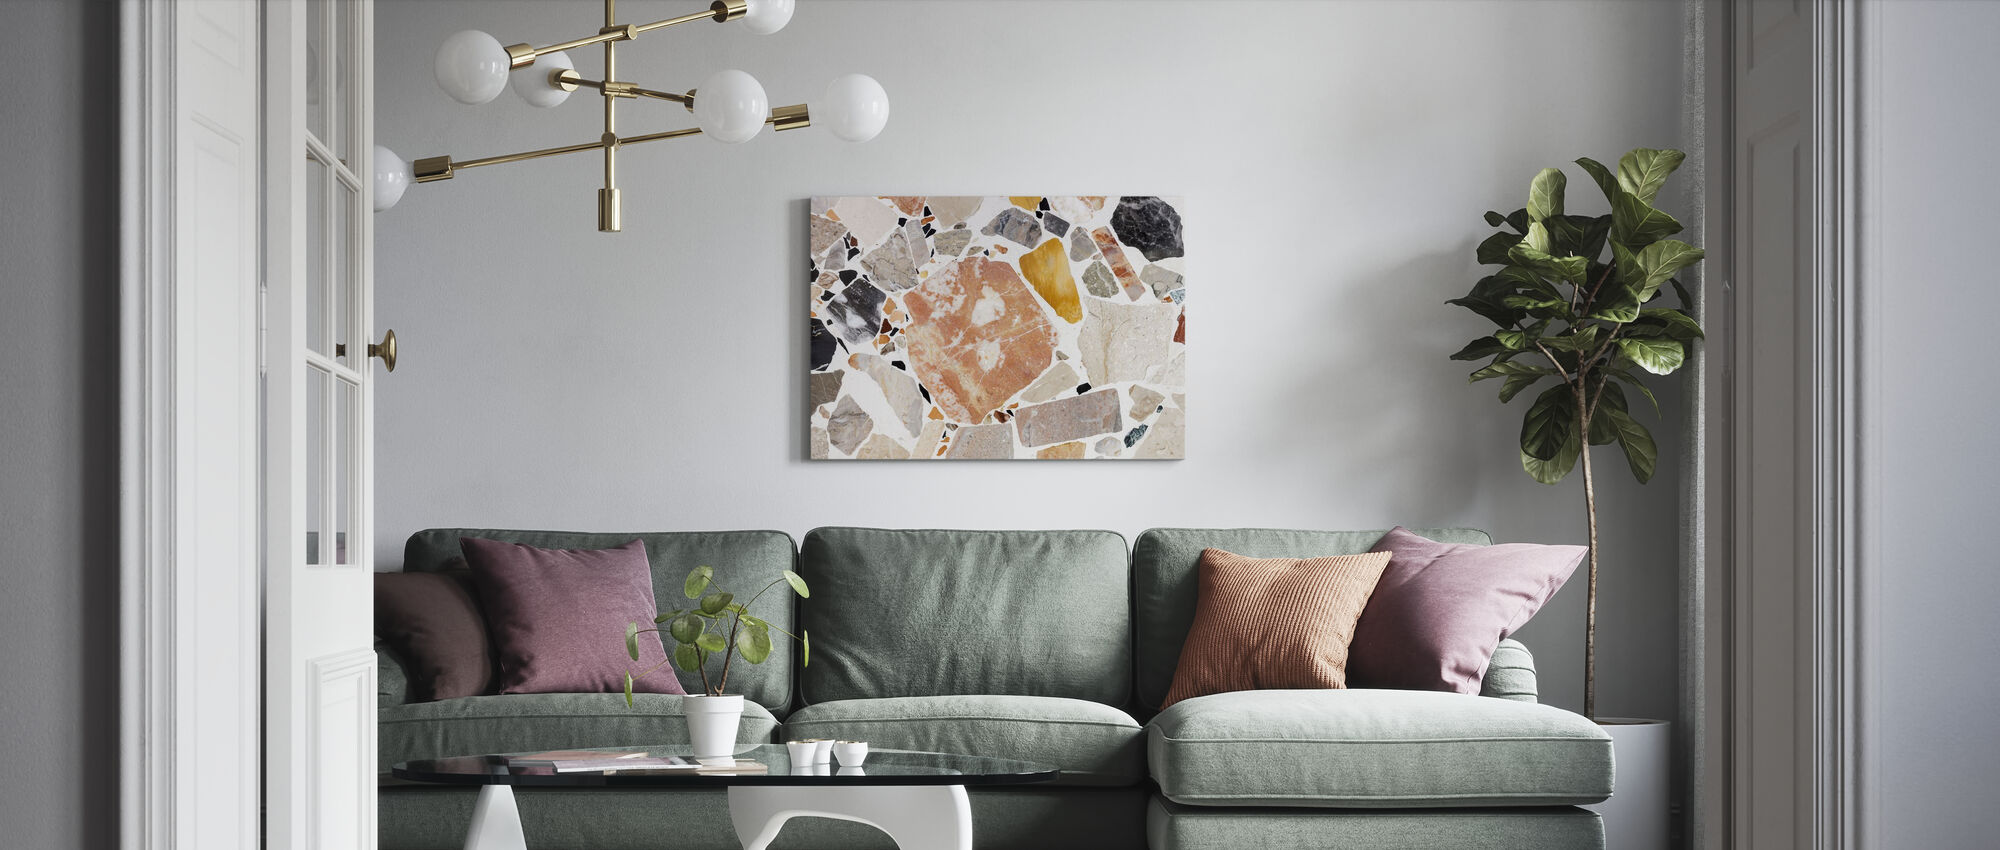 Varm Terrazzo - Canvas print - Woonkamer